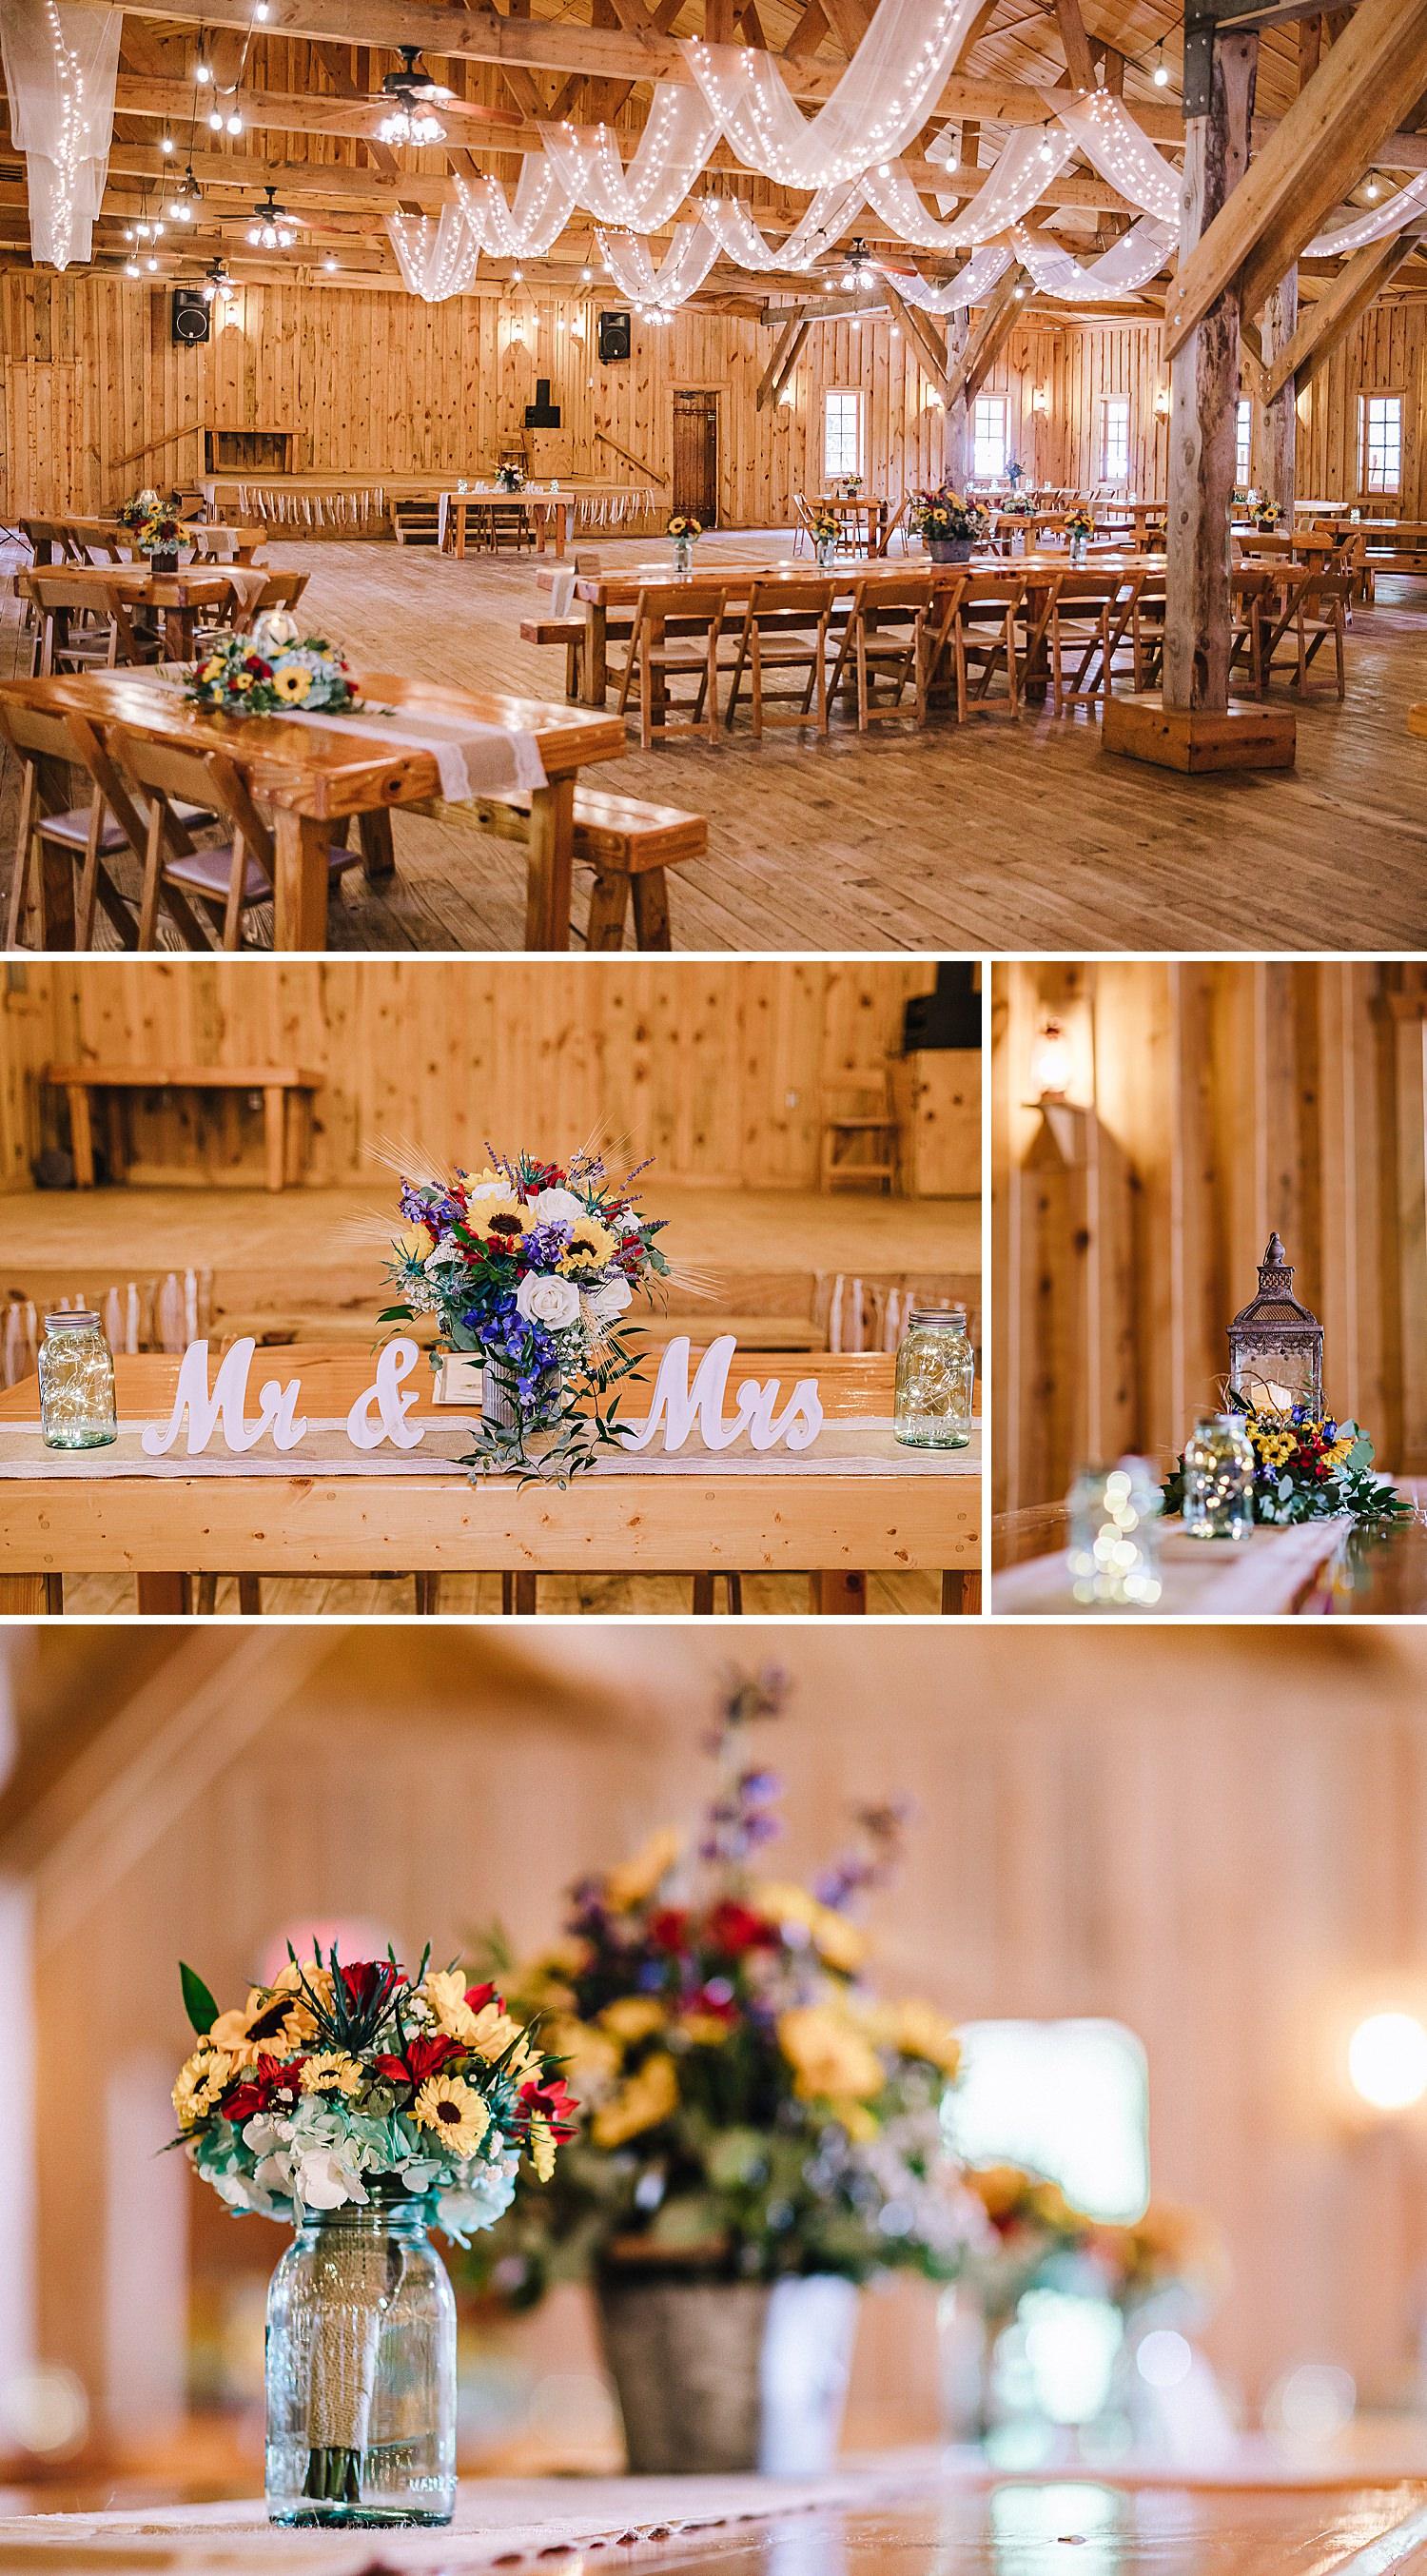 Carly-Barton-Photography-Old-Town-Texas-Rustic-Wedding-Photos-Sunflowers-Boots-Kyle-Texas_0017.jpg